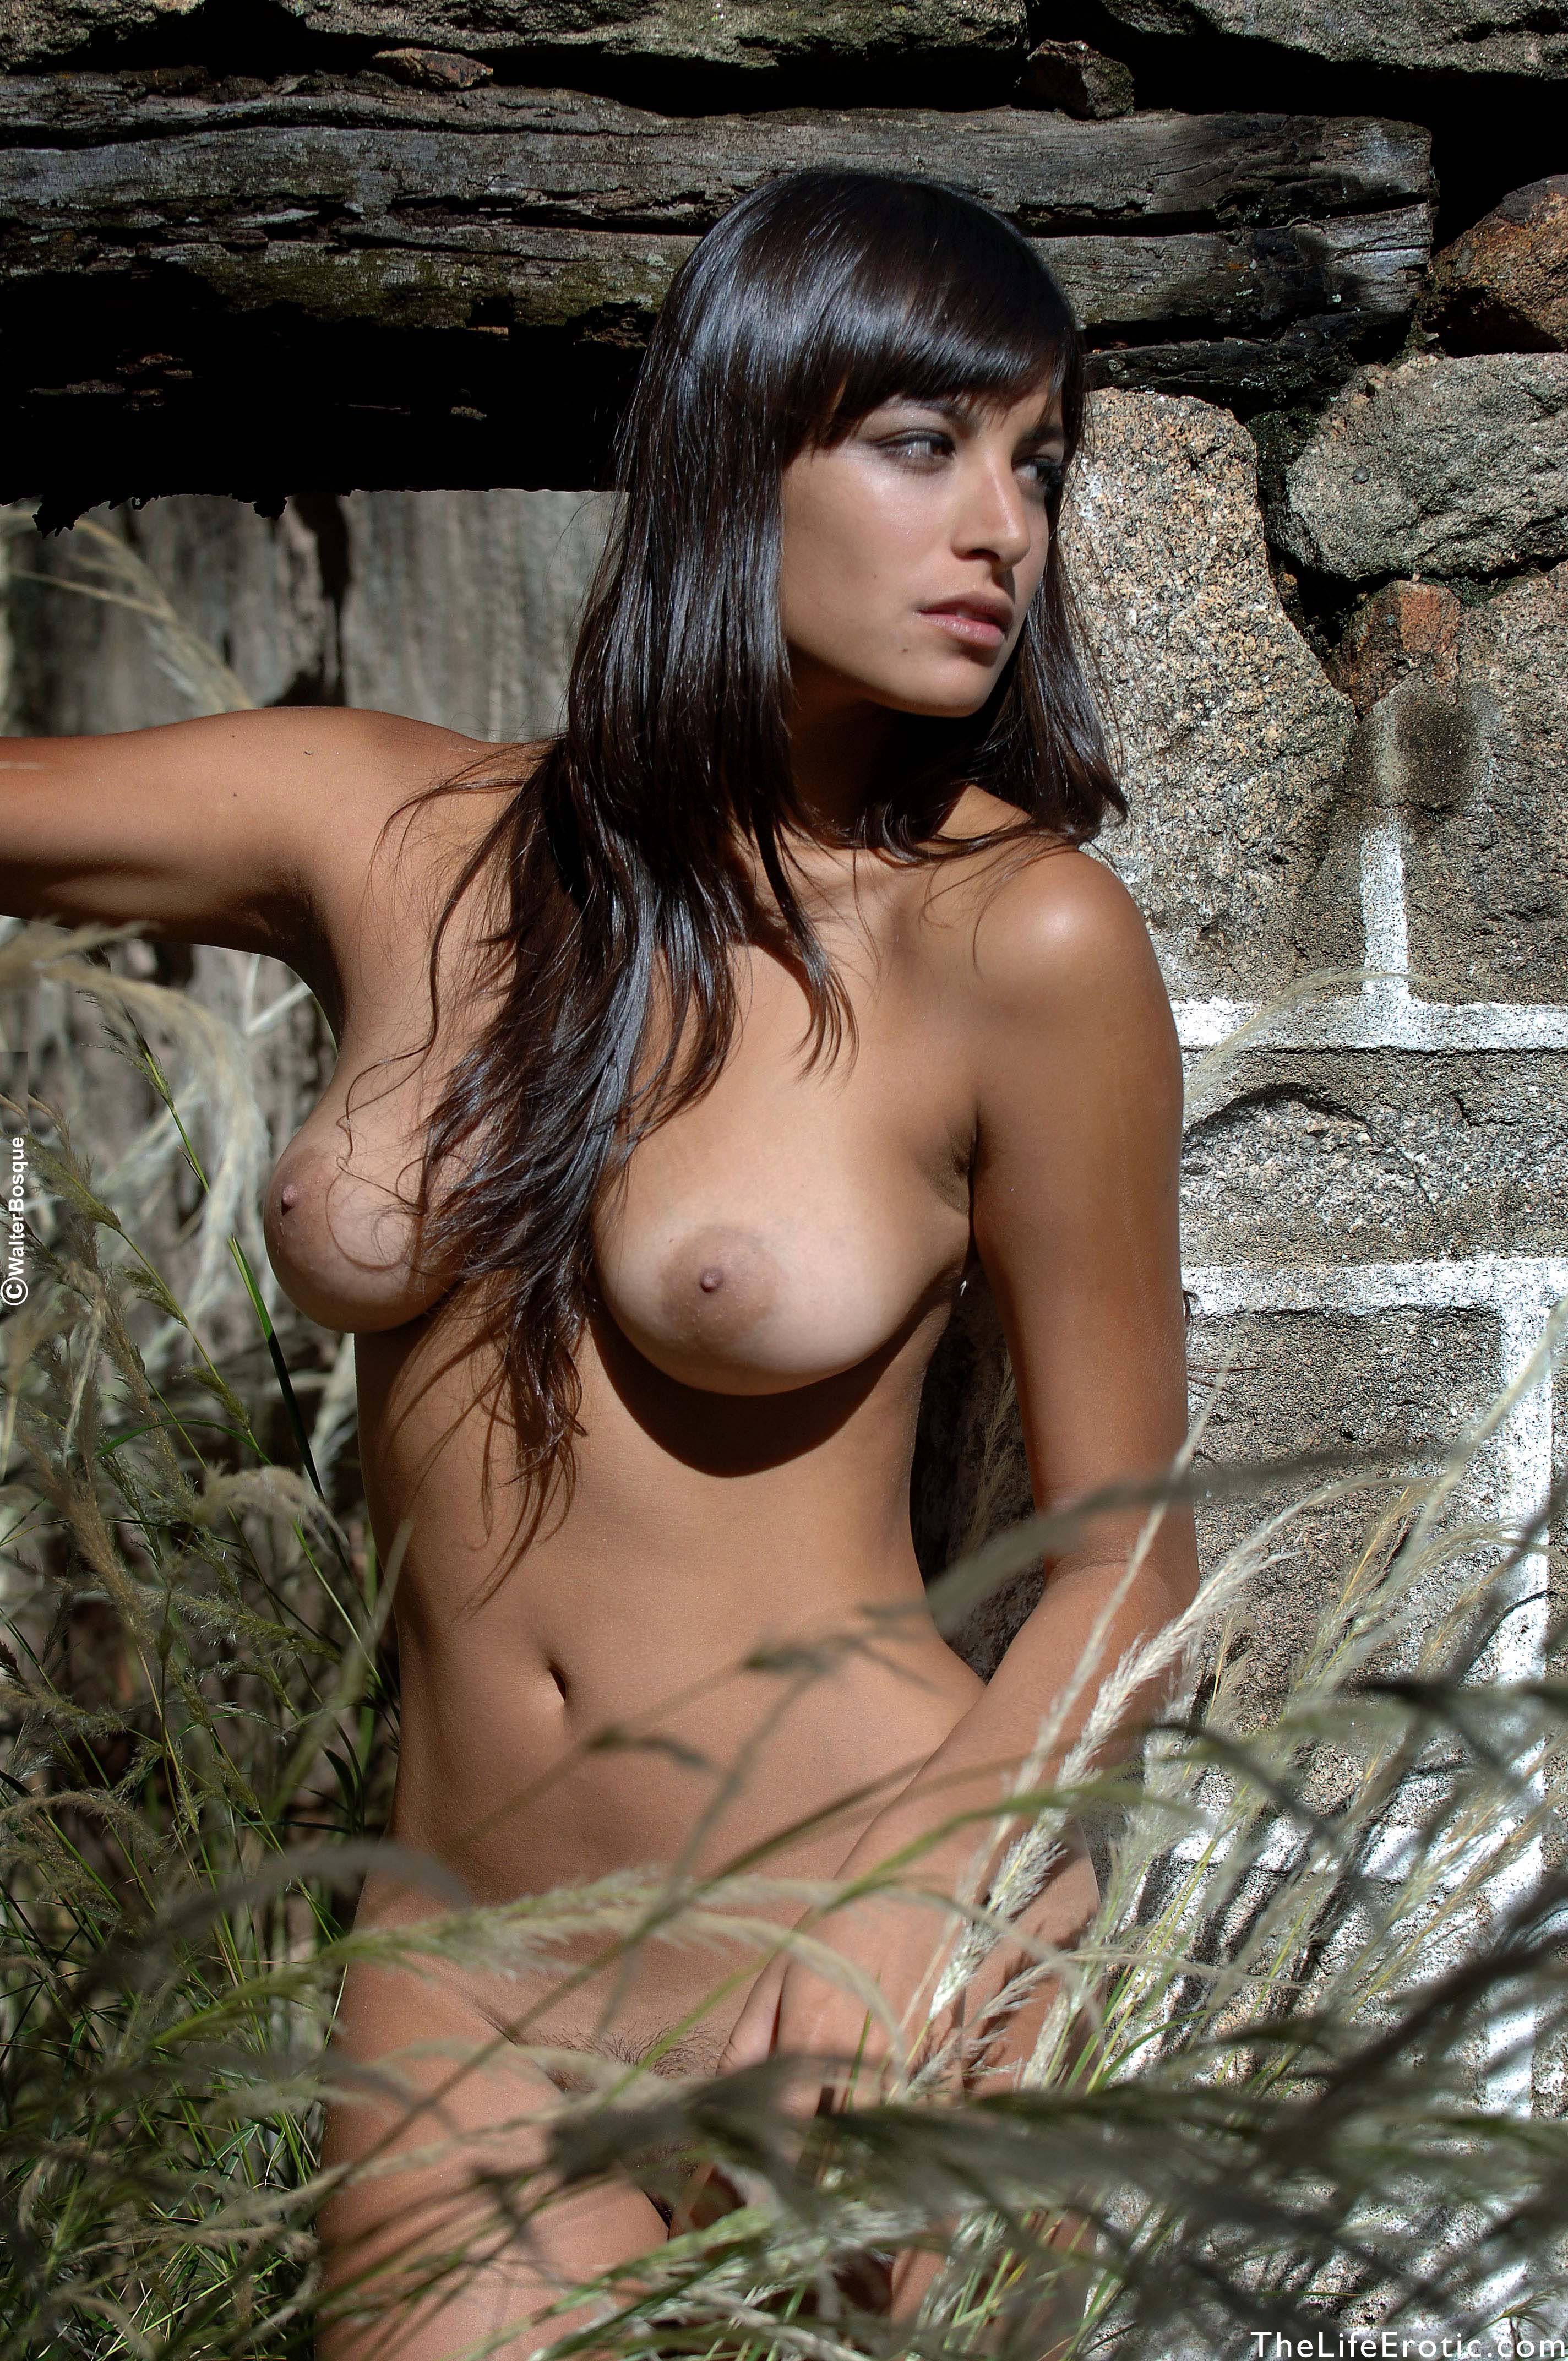 Lola - Posada - NudesPuri.com